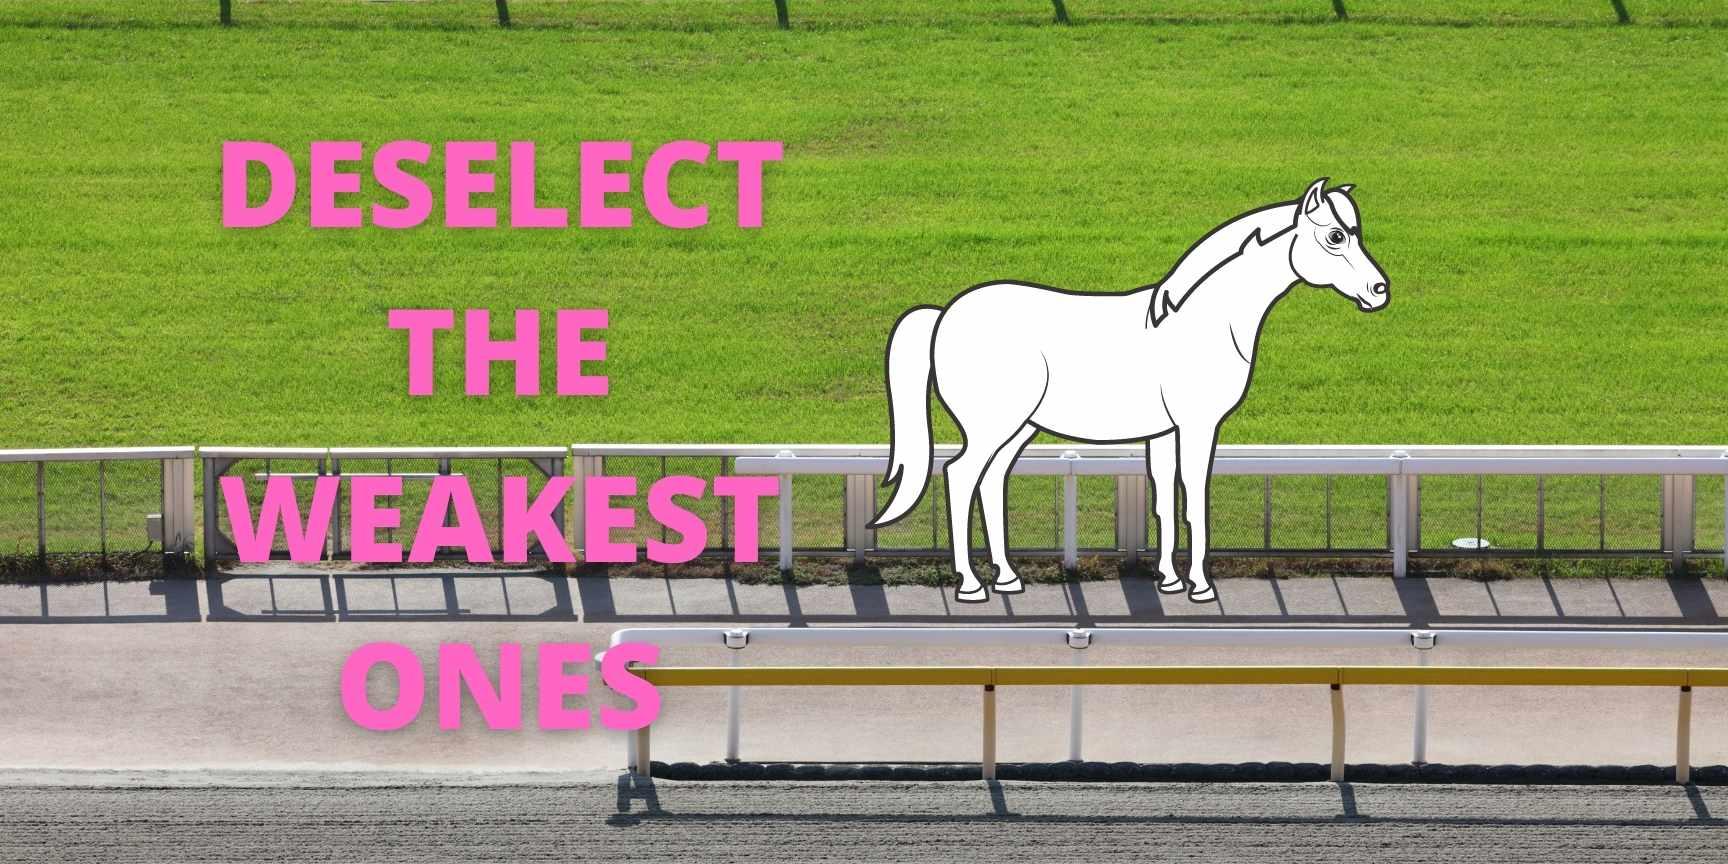 deselect the weakest ones